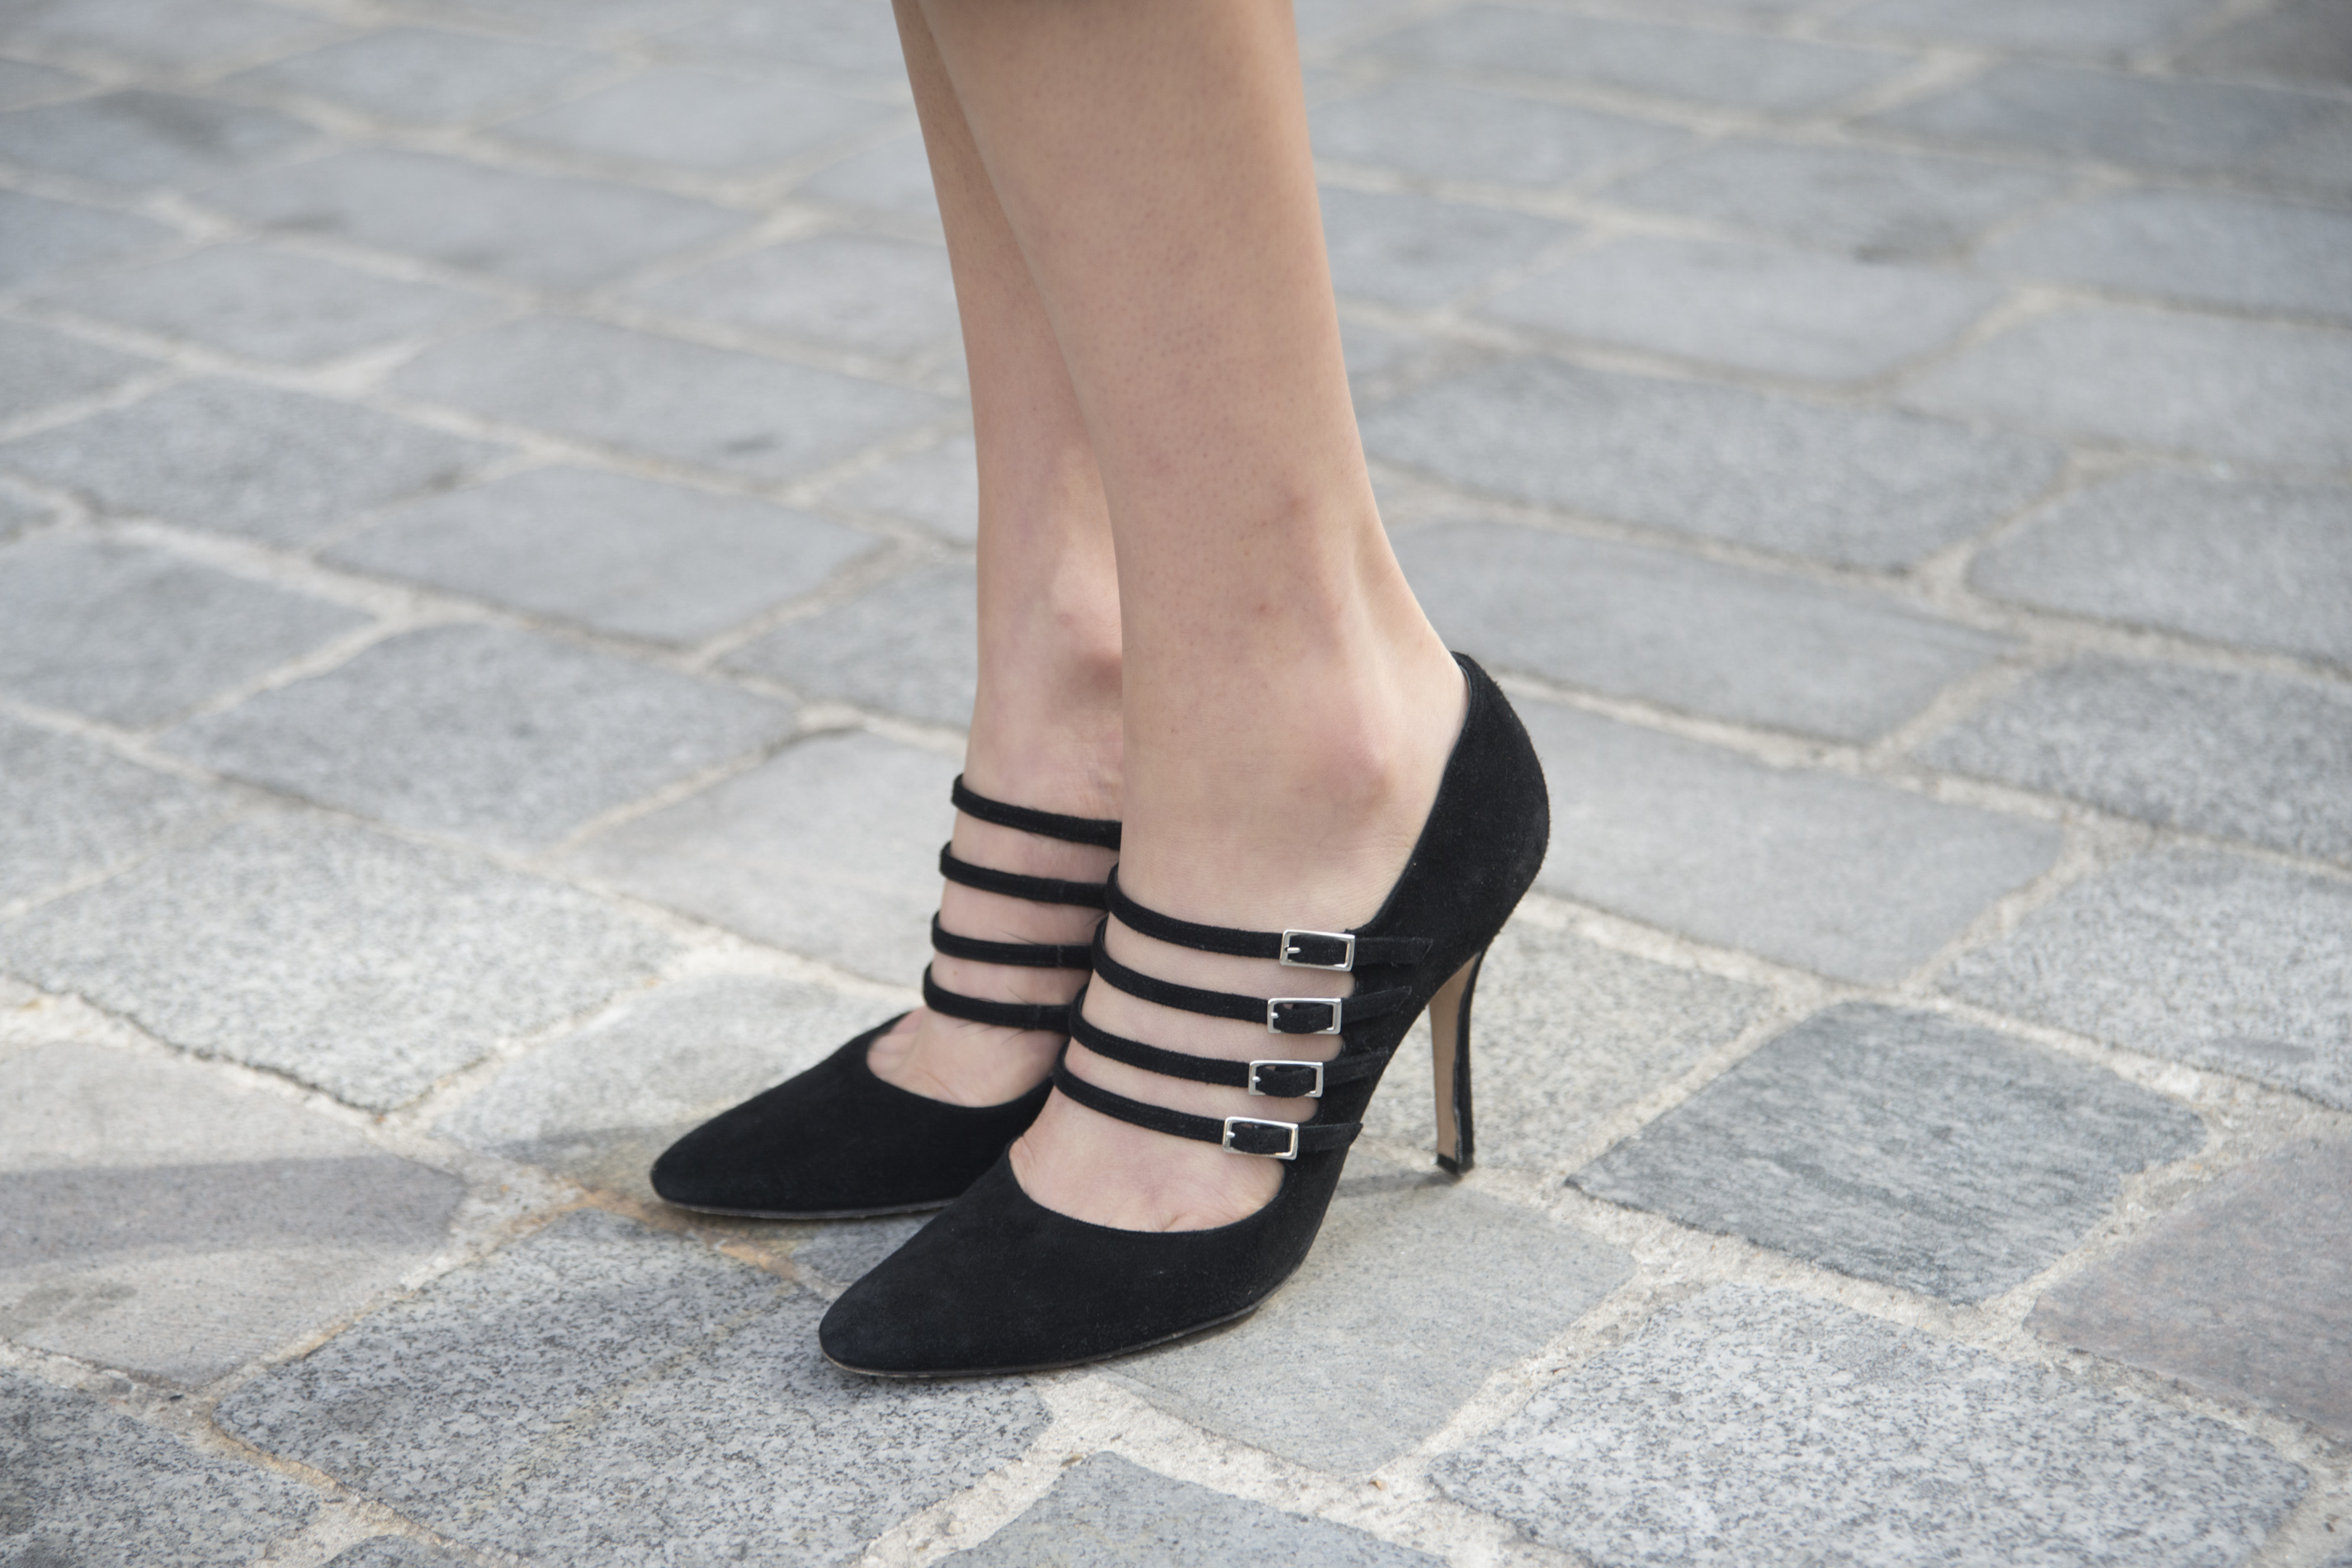 Manolo Blahnik shoes spotted during Paris Fashion Week